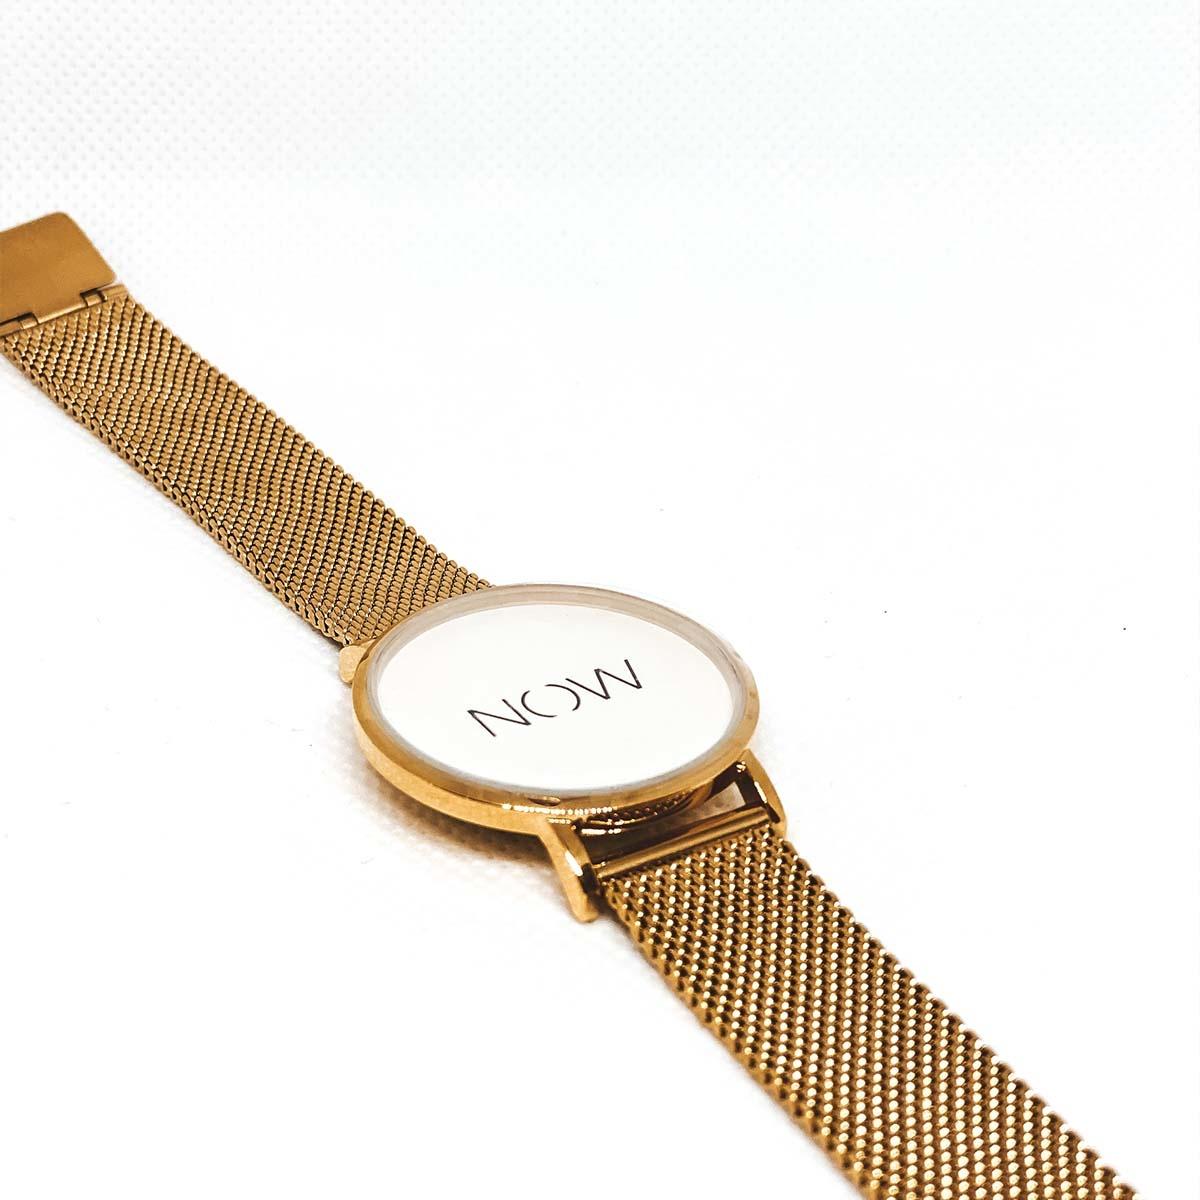 NOW horloge • Mesh Gold